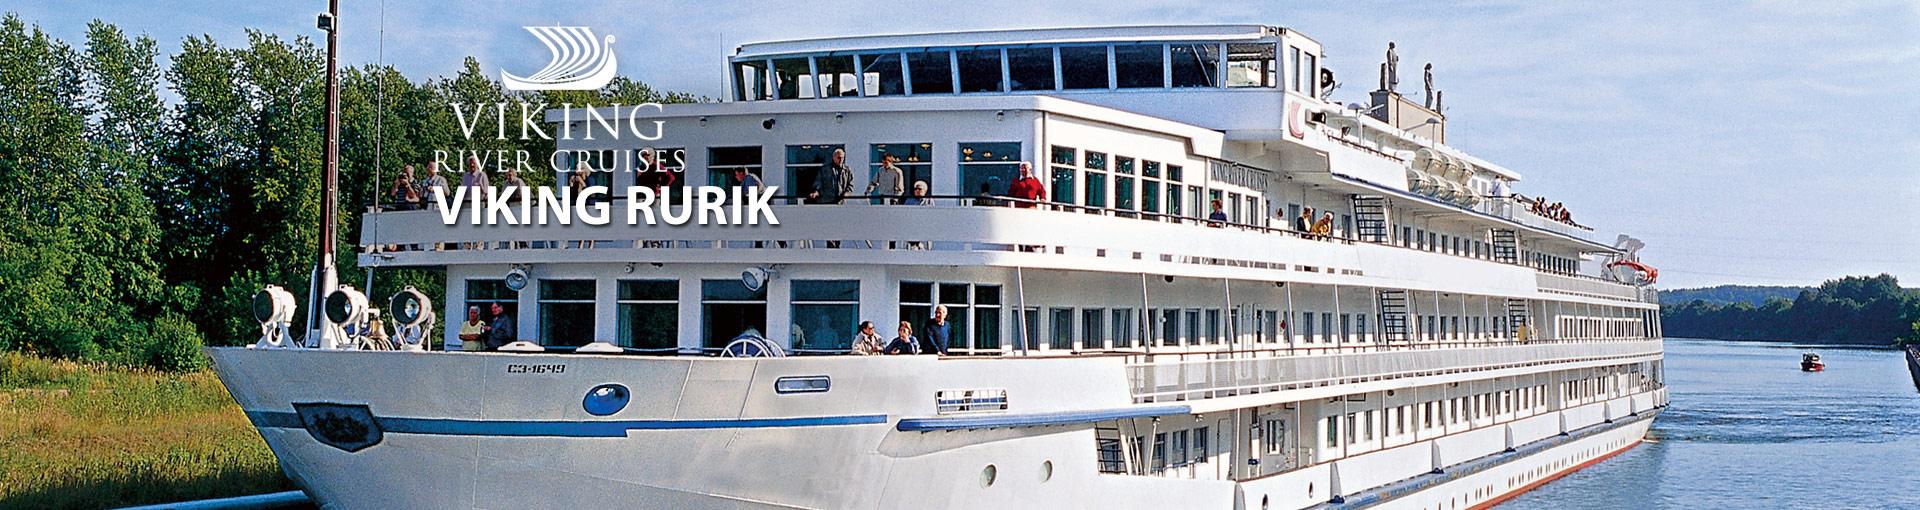 Viking Rivers Viking Rurik river cruise ship